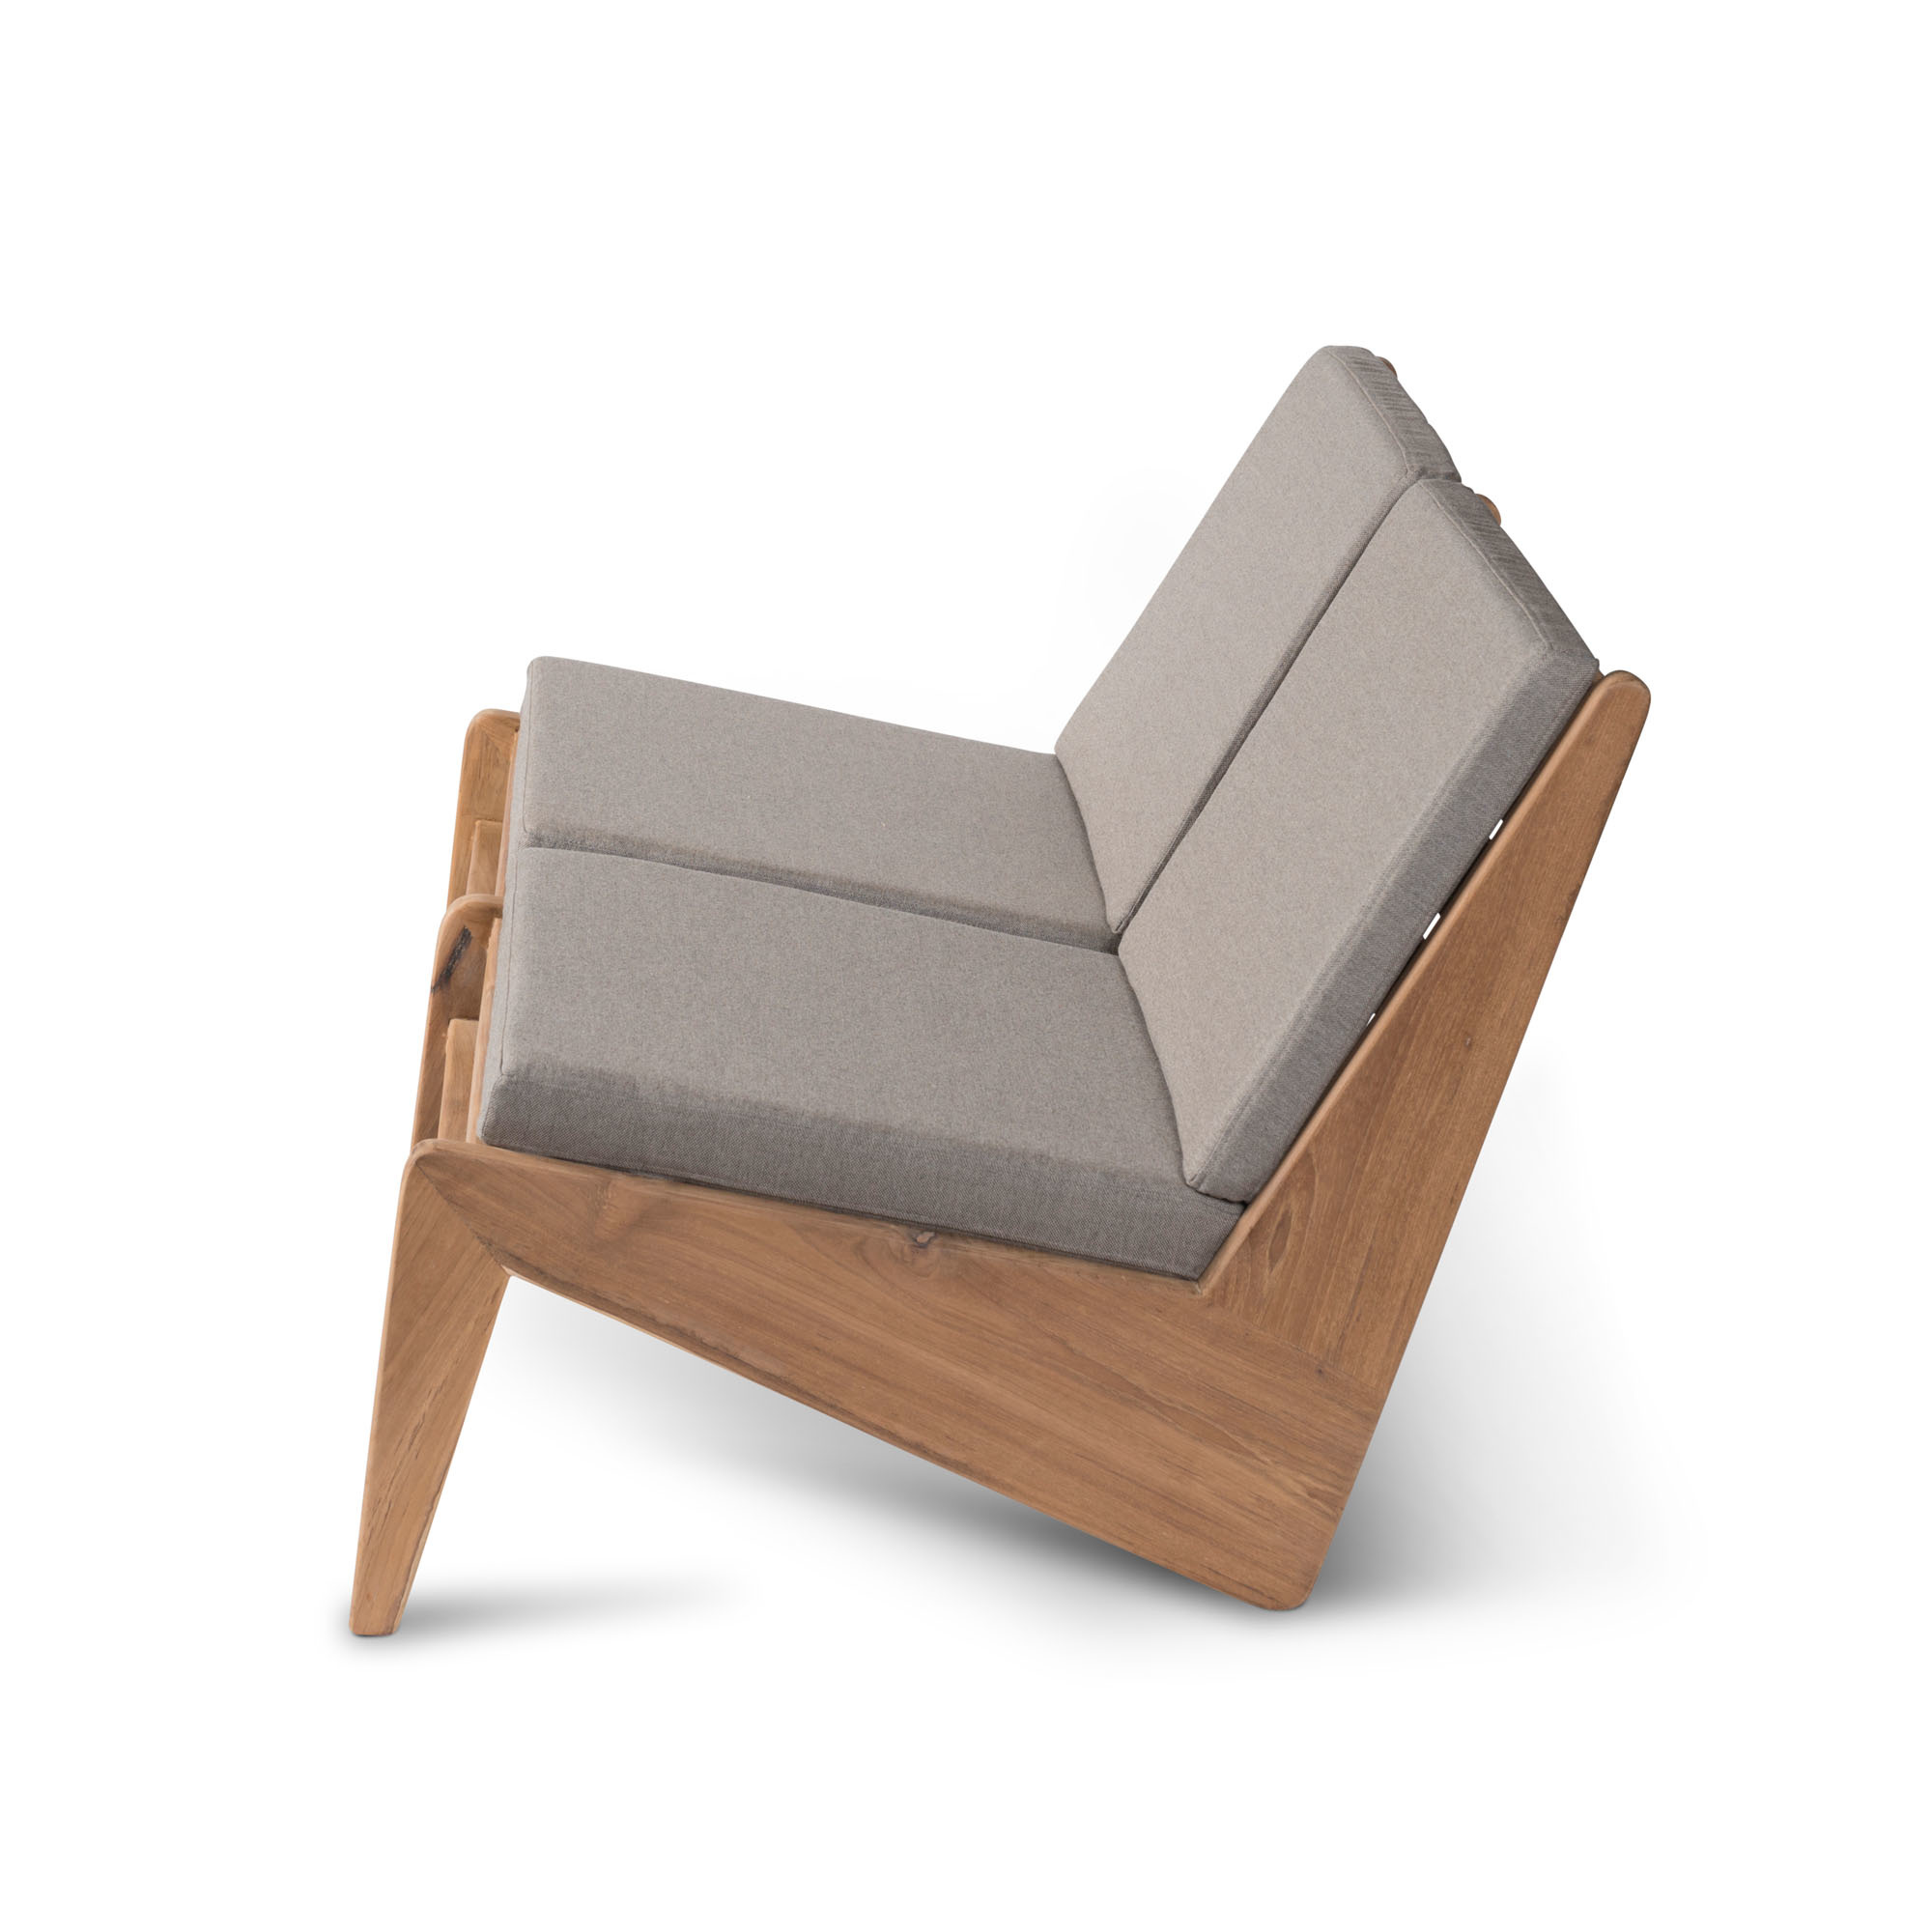 Kangaroo Chair  Bench 2 - Teak Outdoor with Cushion-2